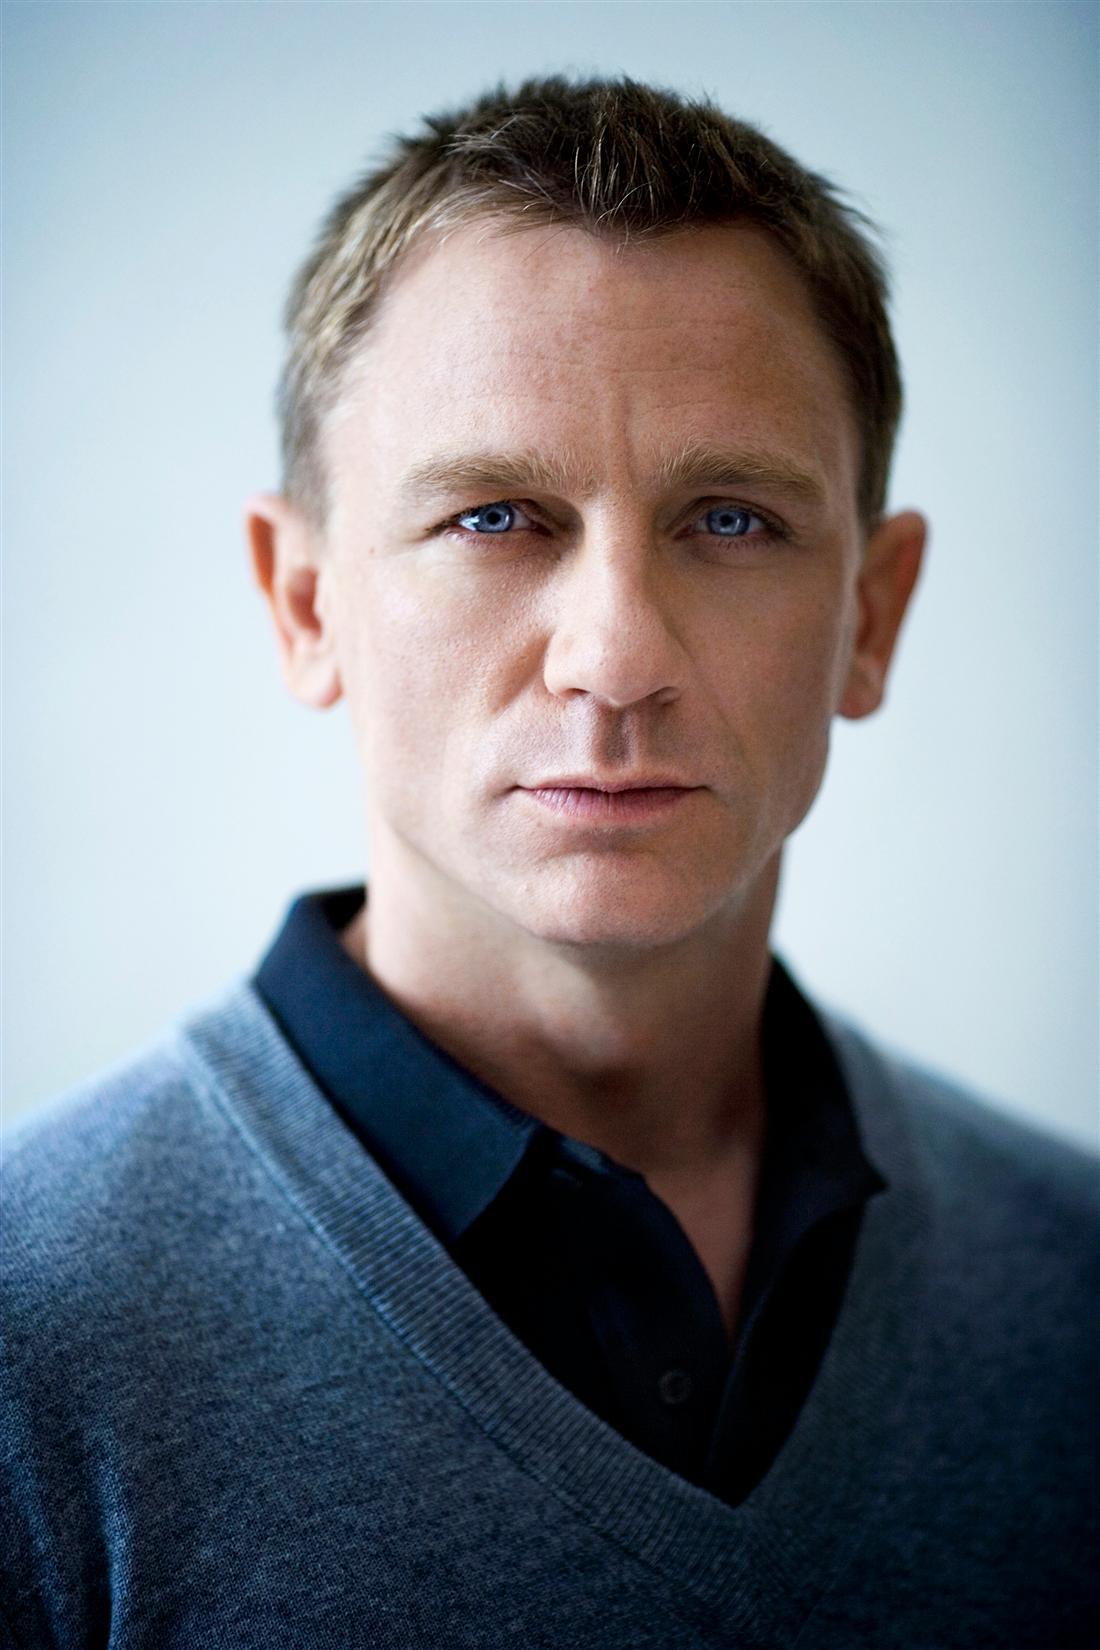 Virile James Bond Hairstyles for Men | Hairstyles 2017 ...